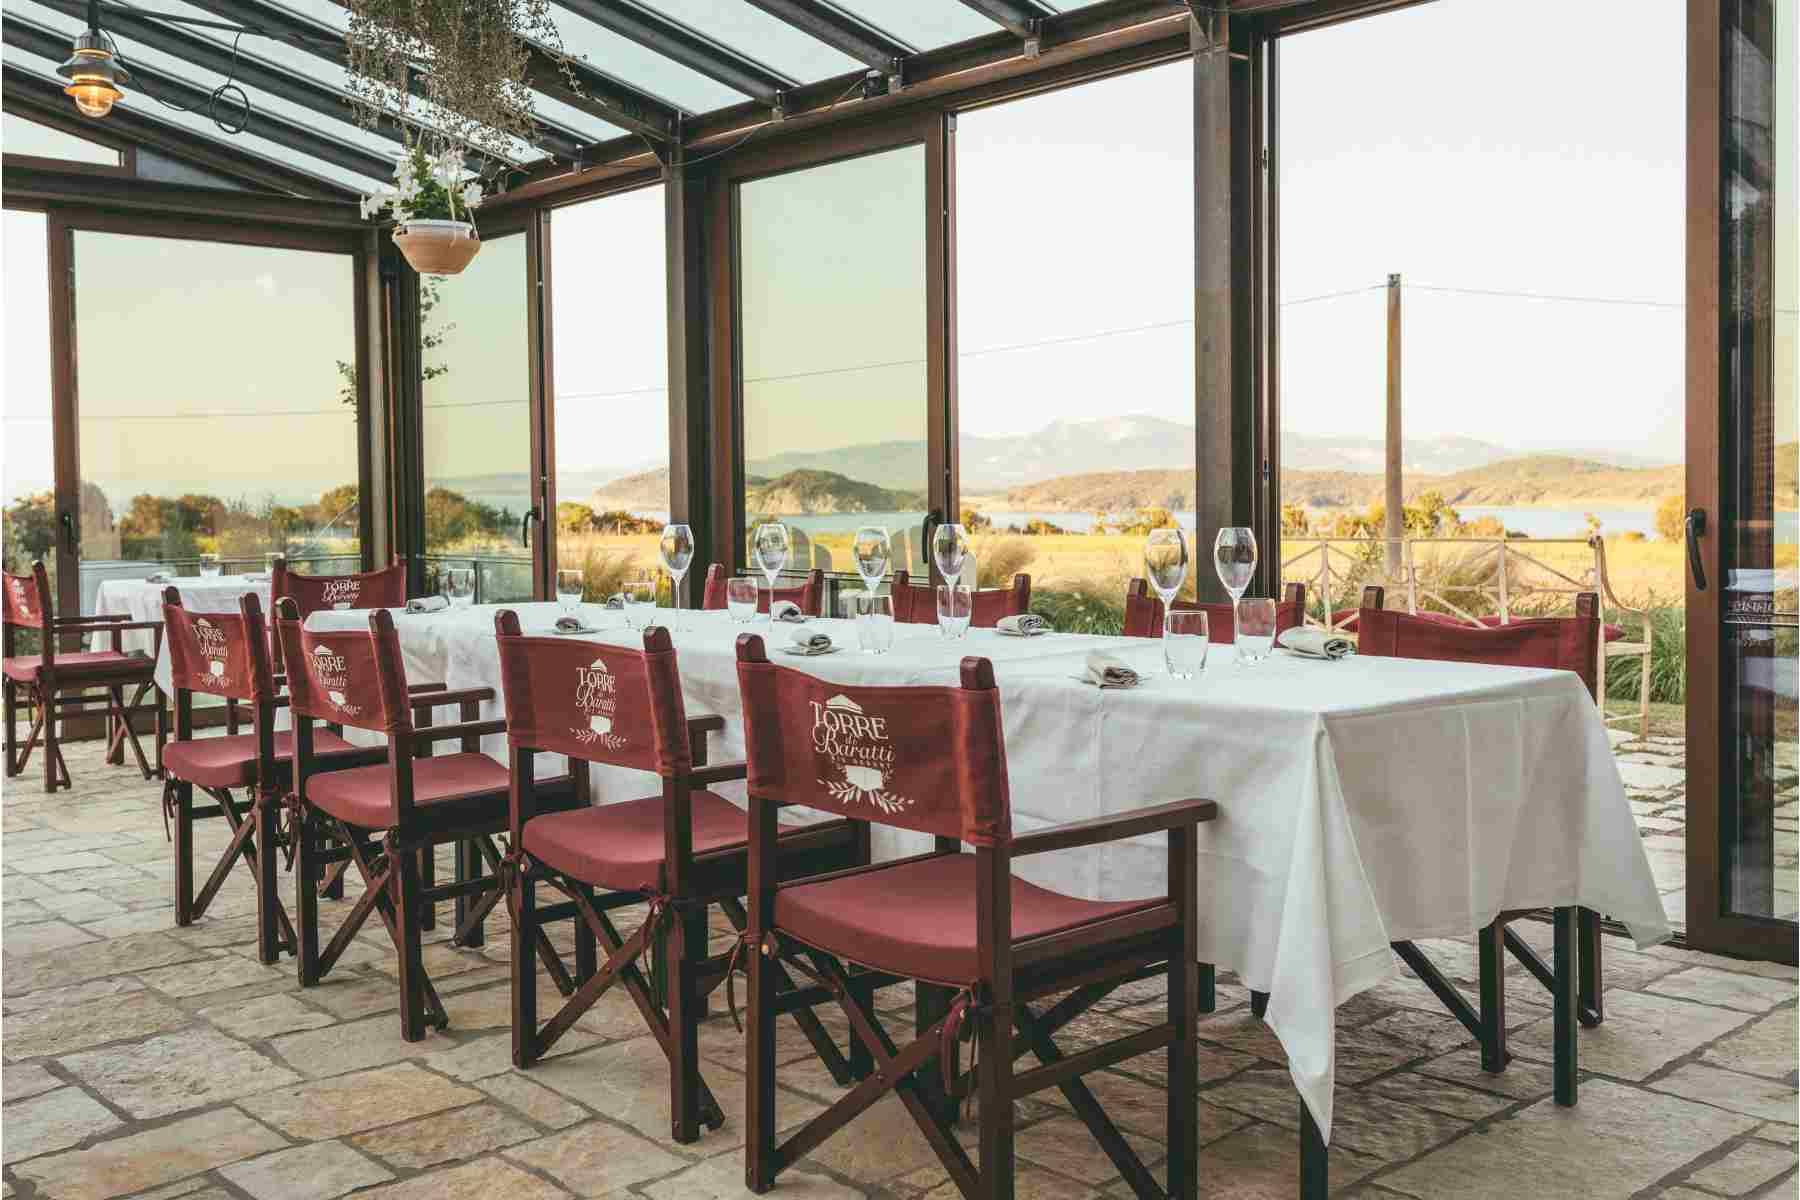 Wedding in BioResort in the Mediterranean scrub - Tuscany Wedding Package